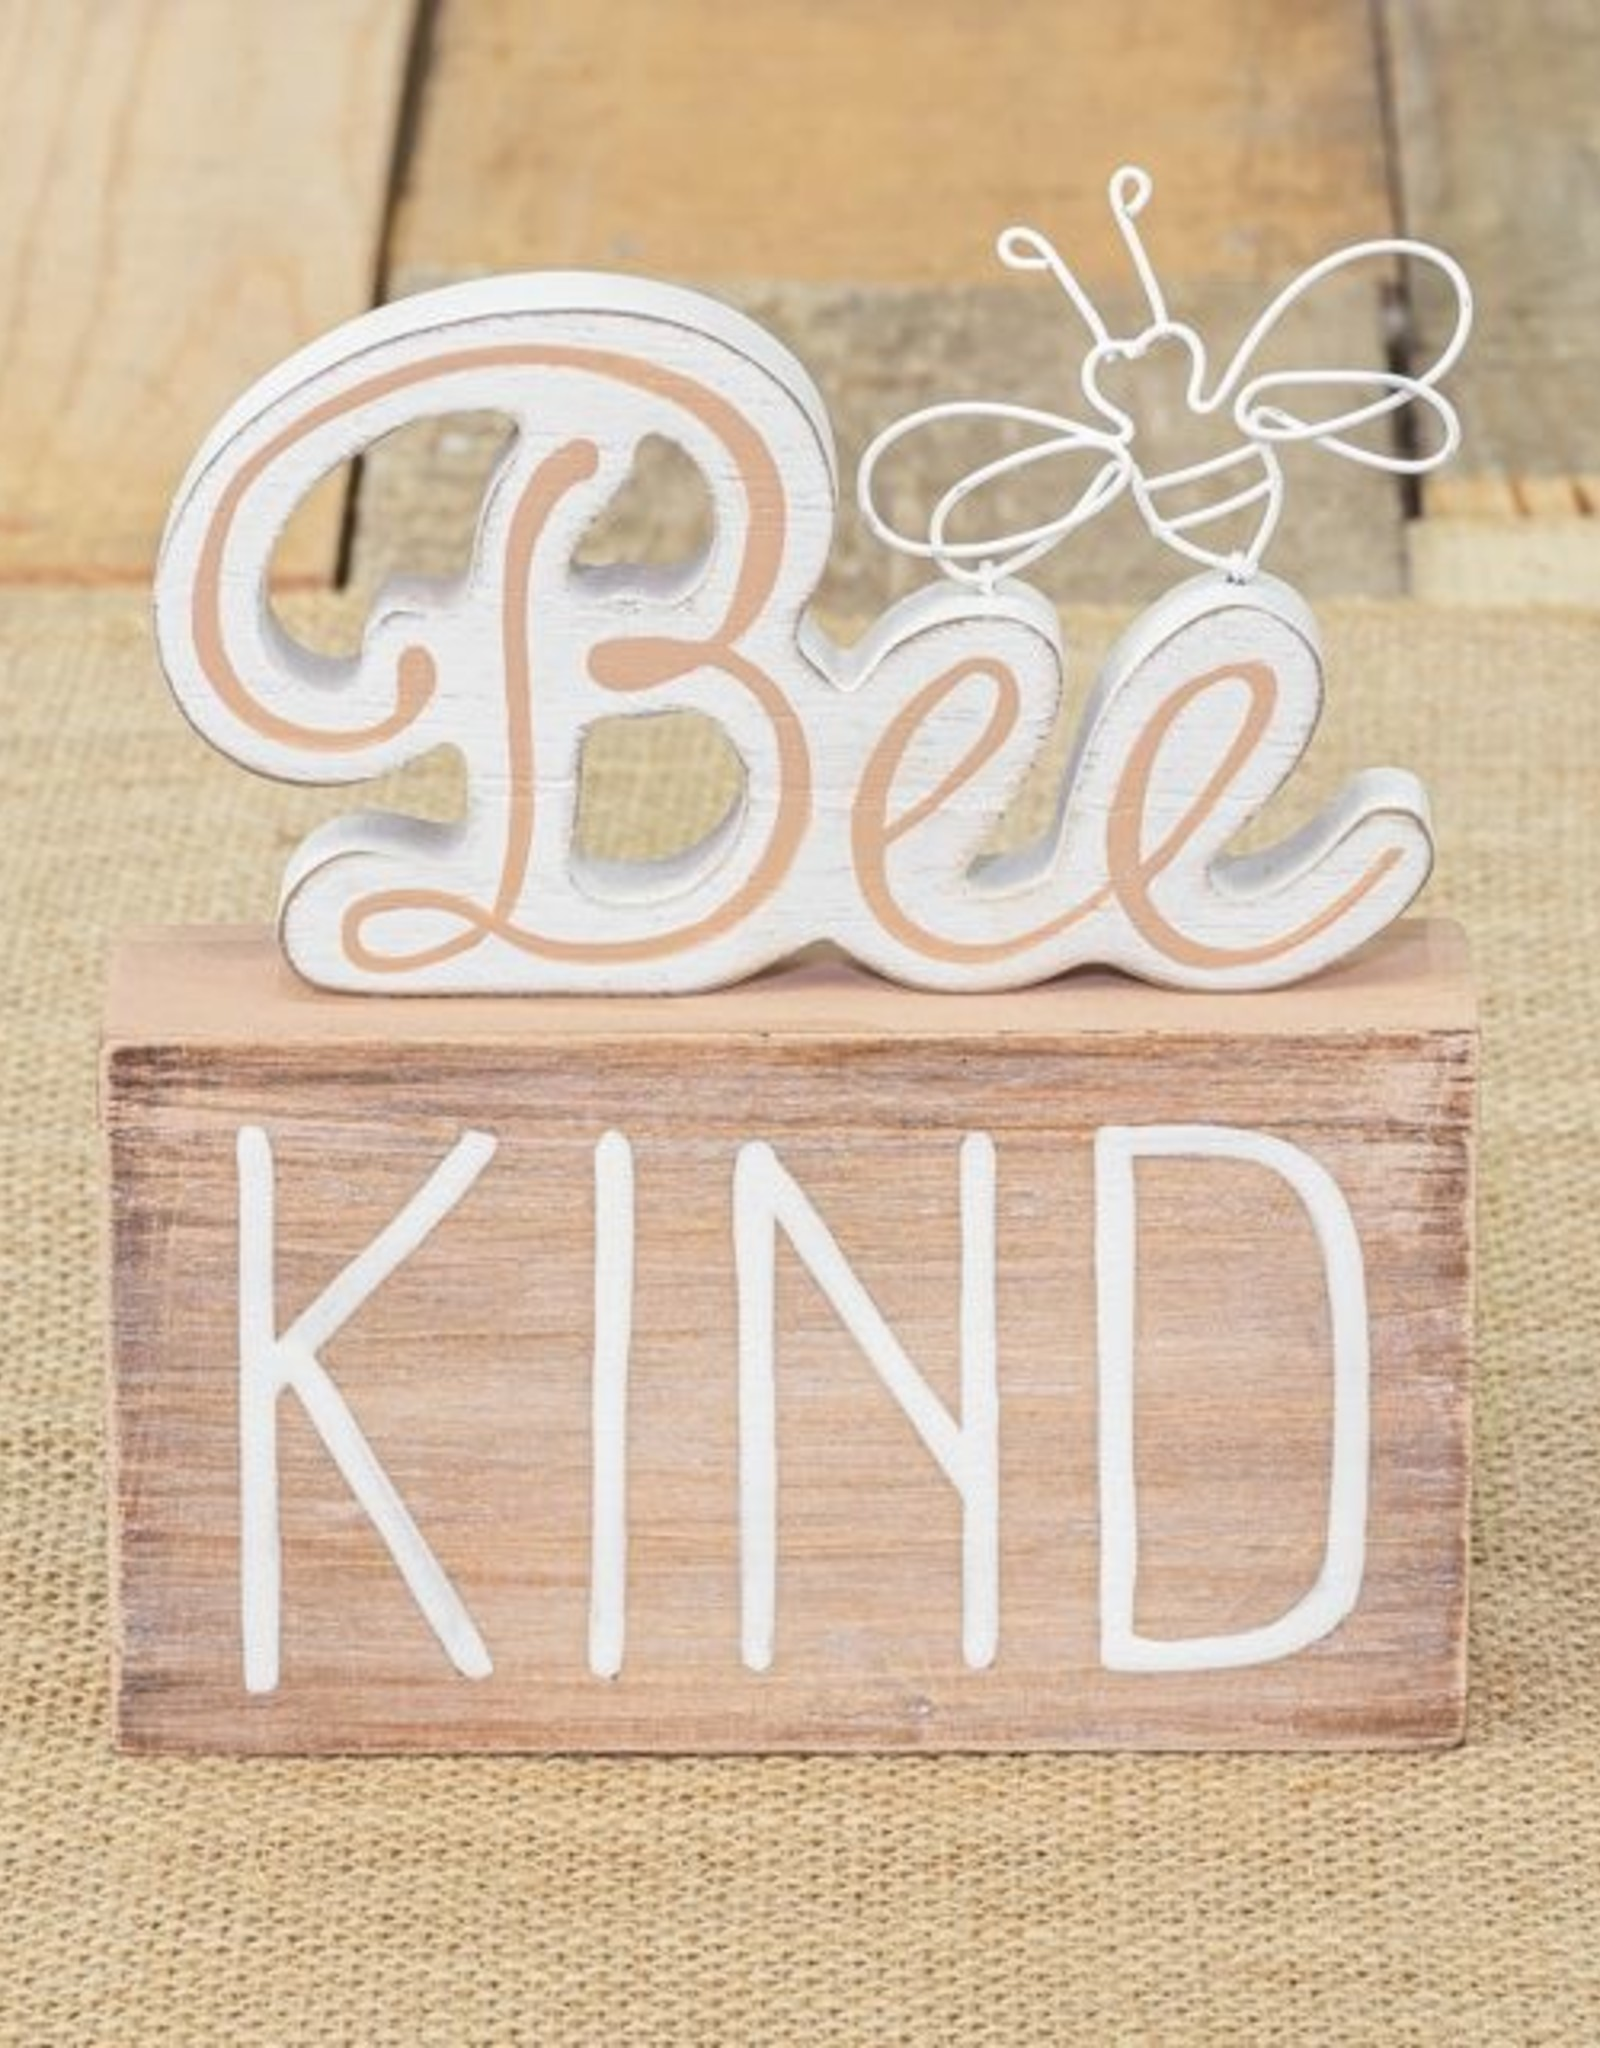 Bee Kind Sitter